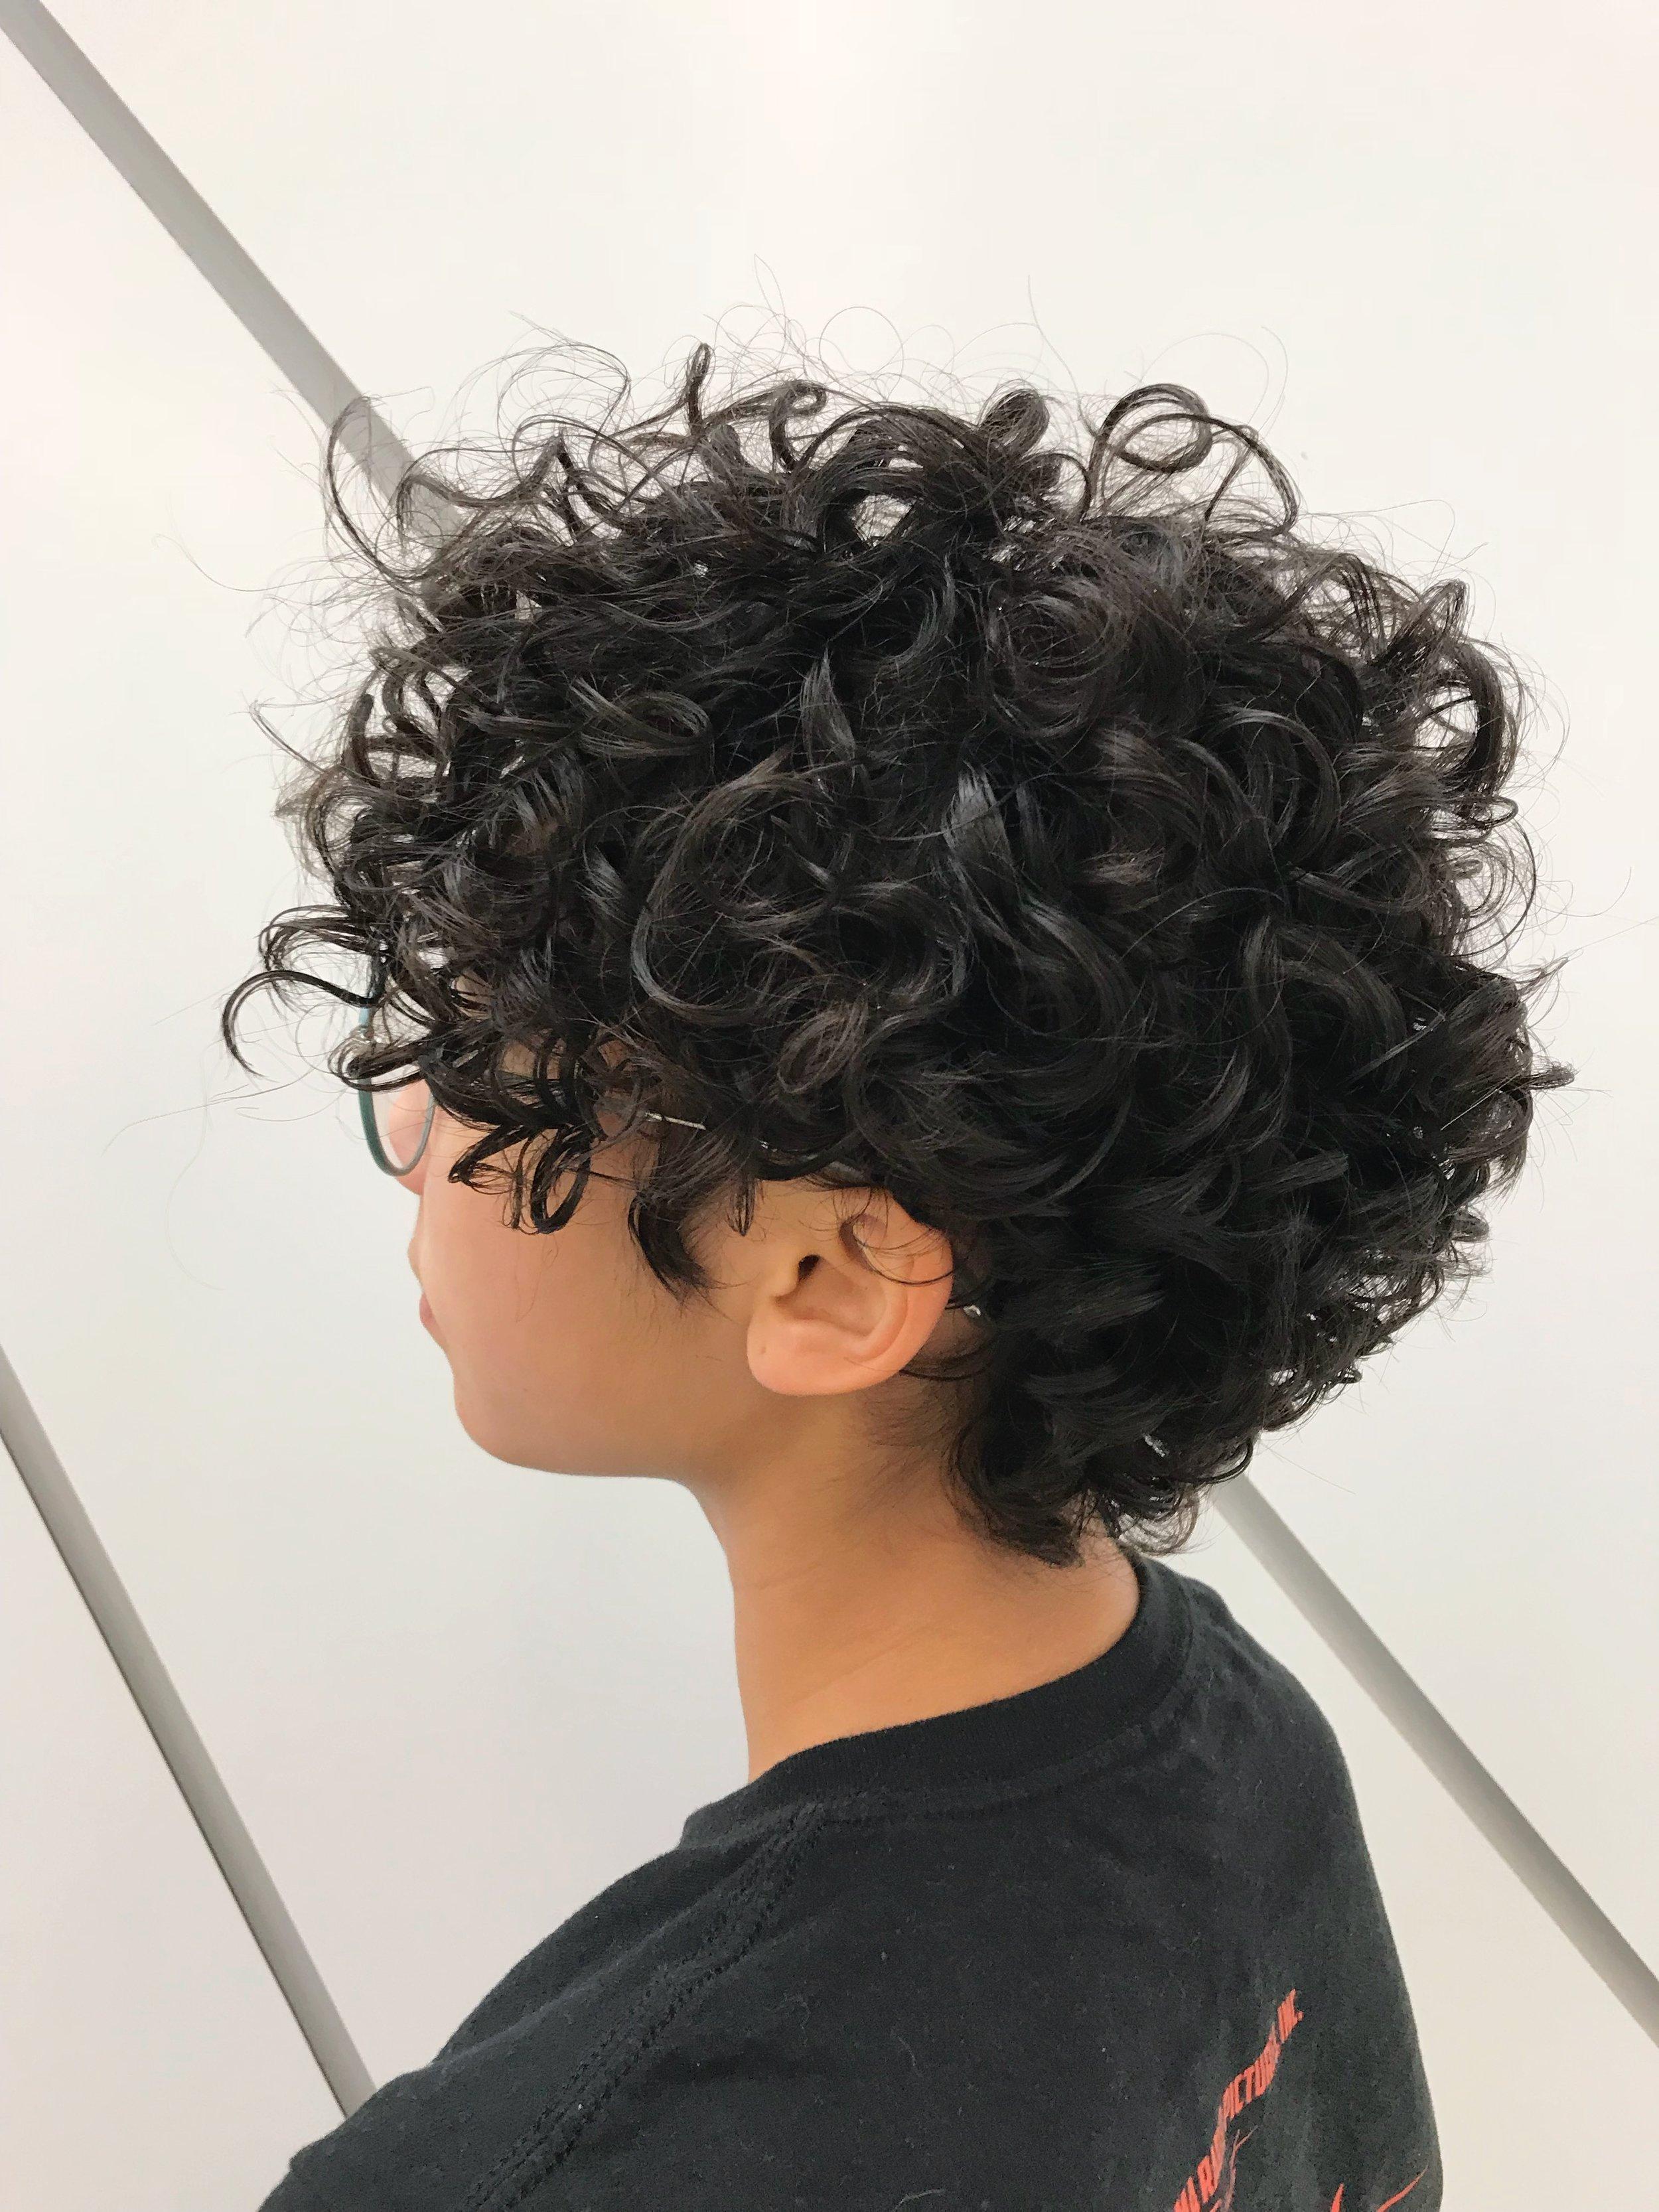 hair04.jpeg